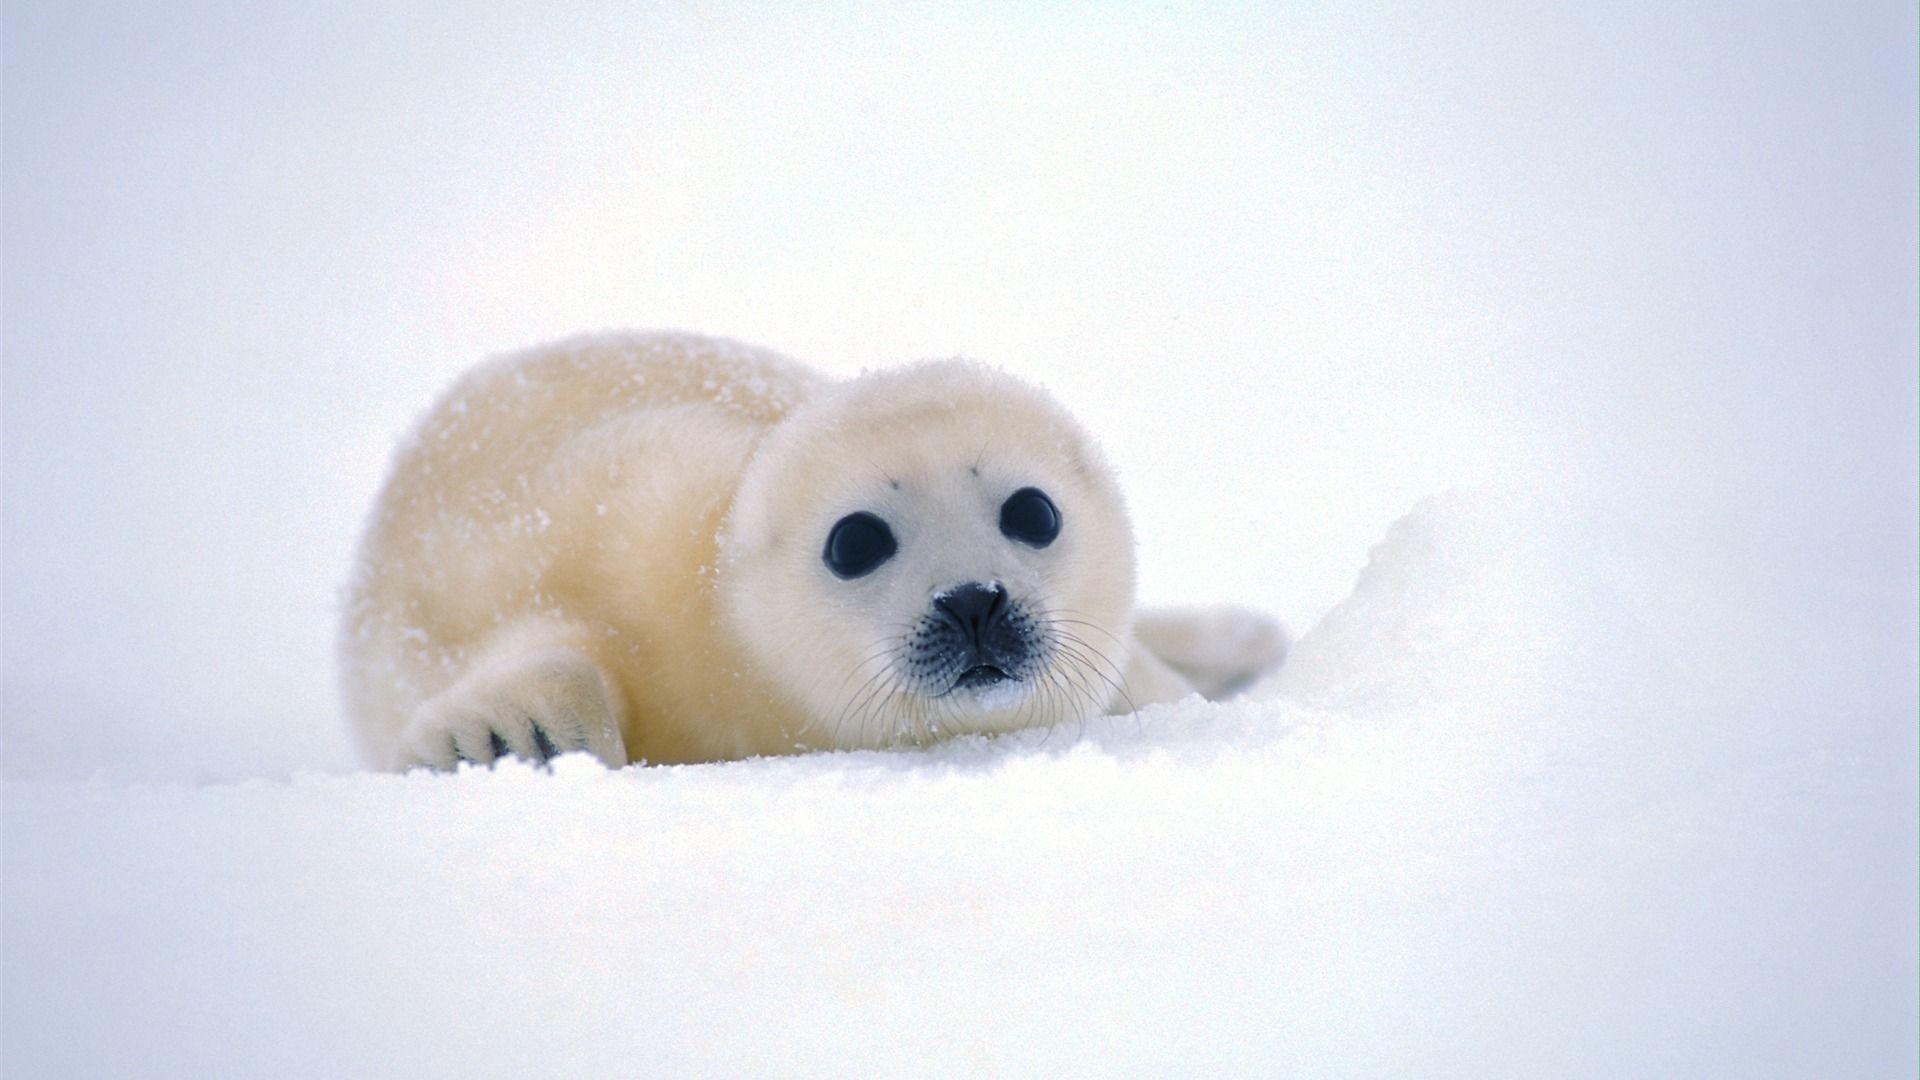 Cute Winter Animal Wallpaper (48+ images)